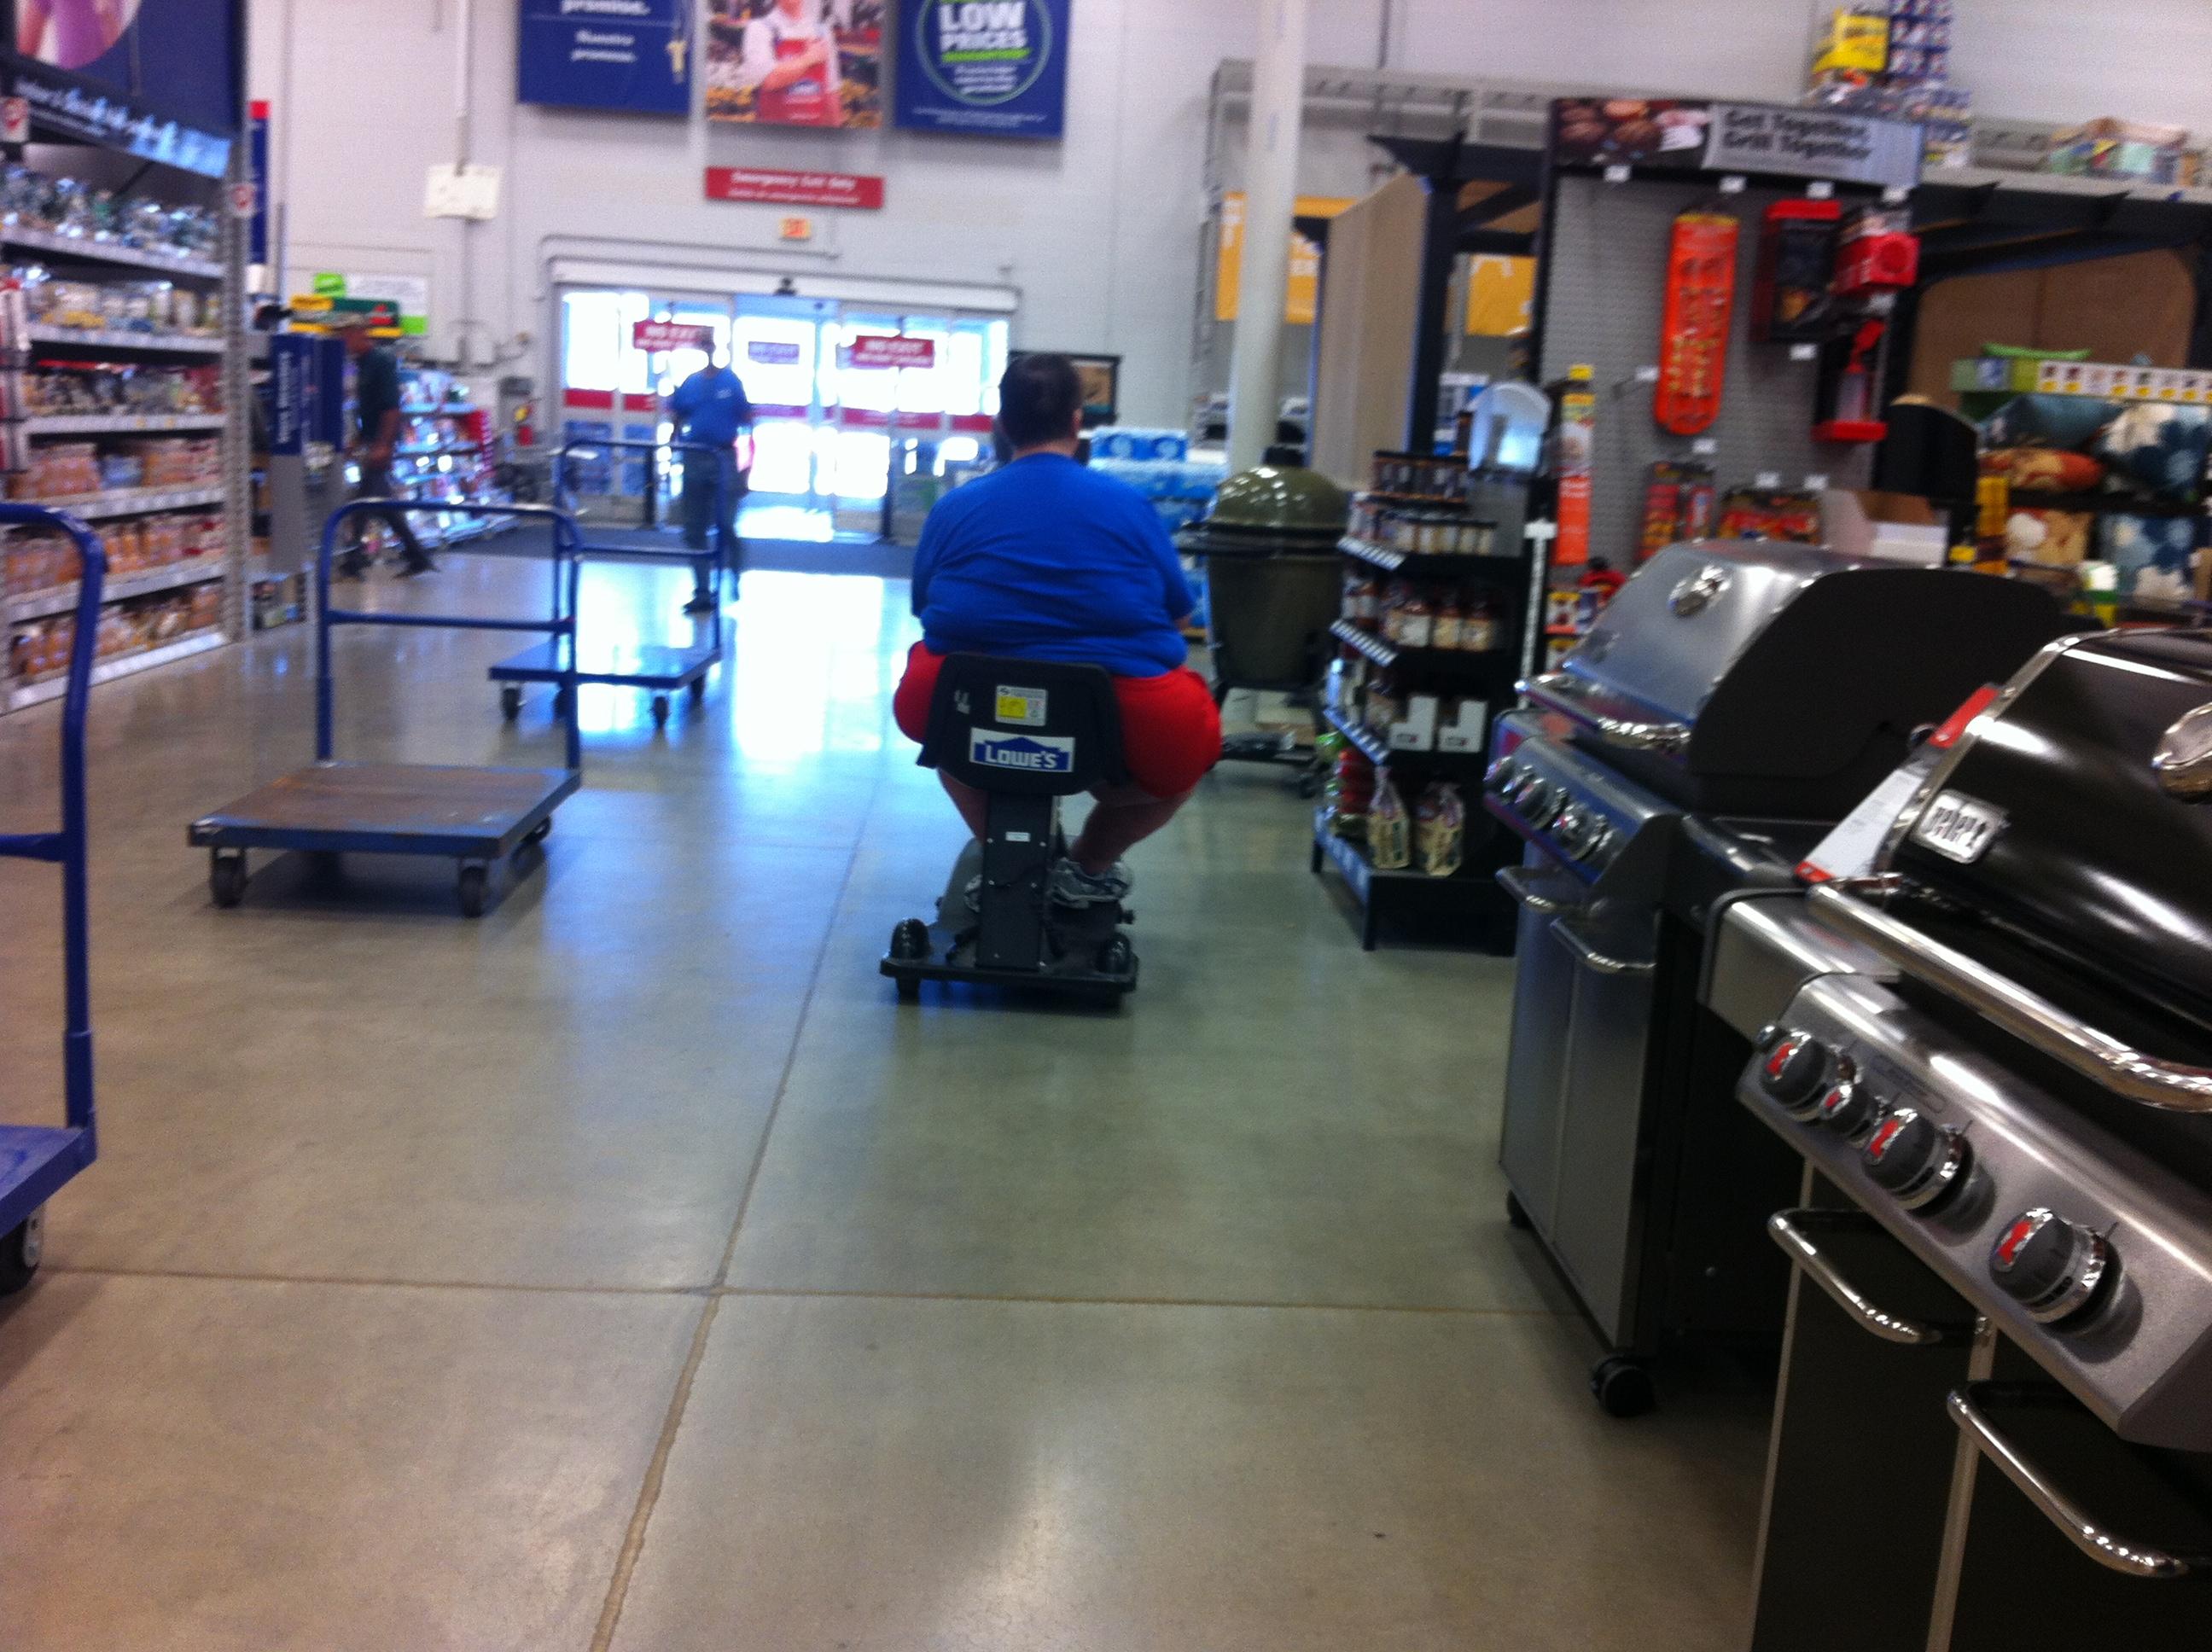 File obese customer in motorized cart at lowe 39 for Motorized cart for seniors